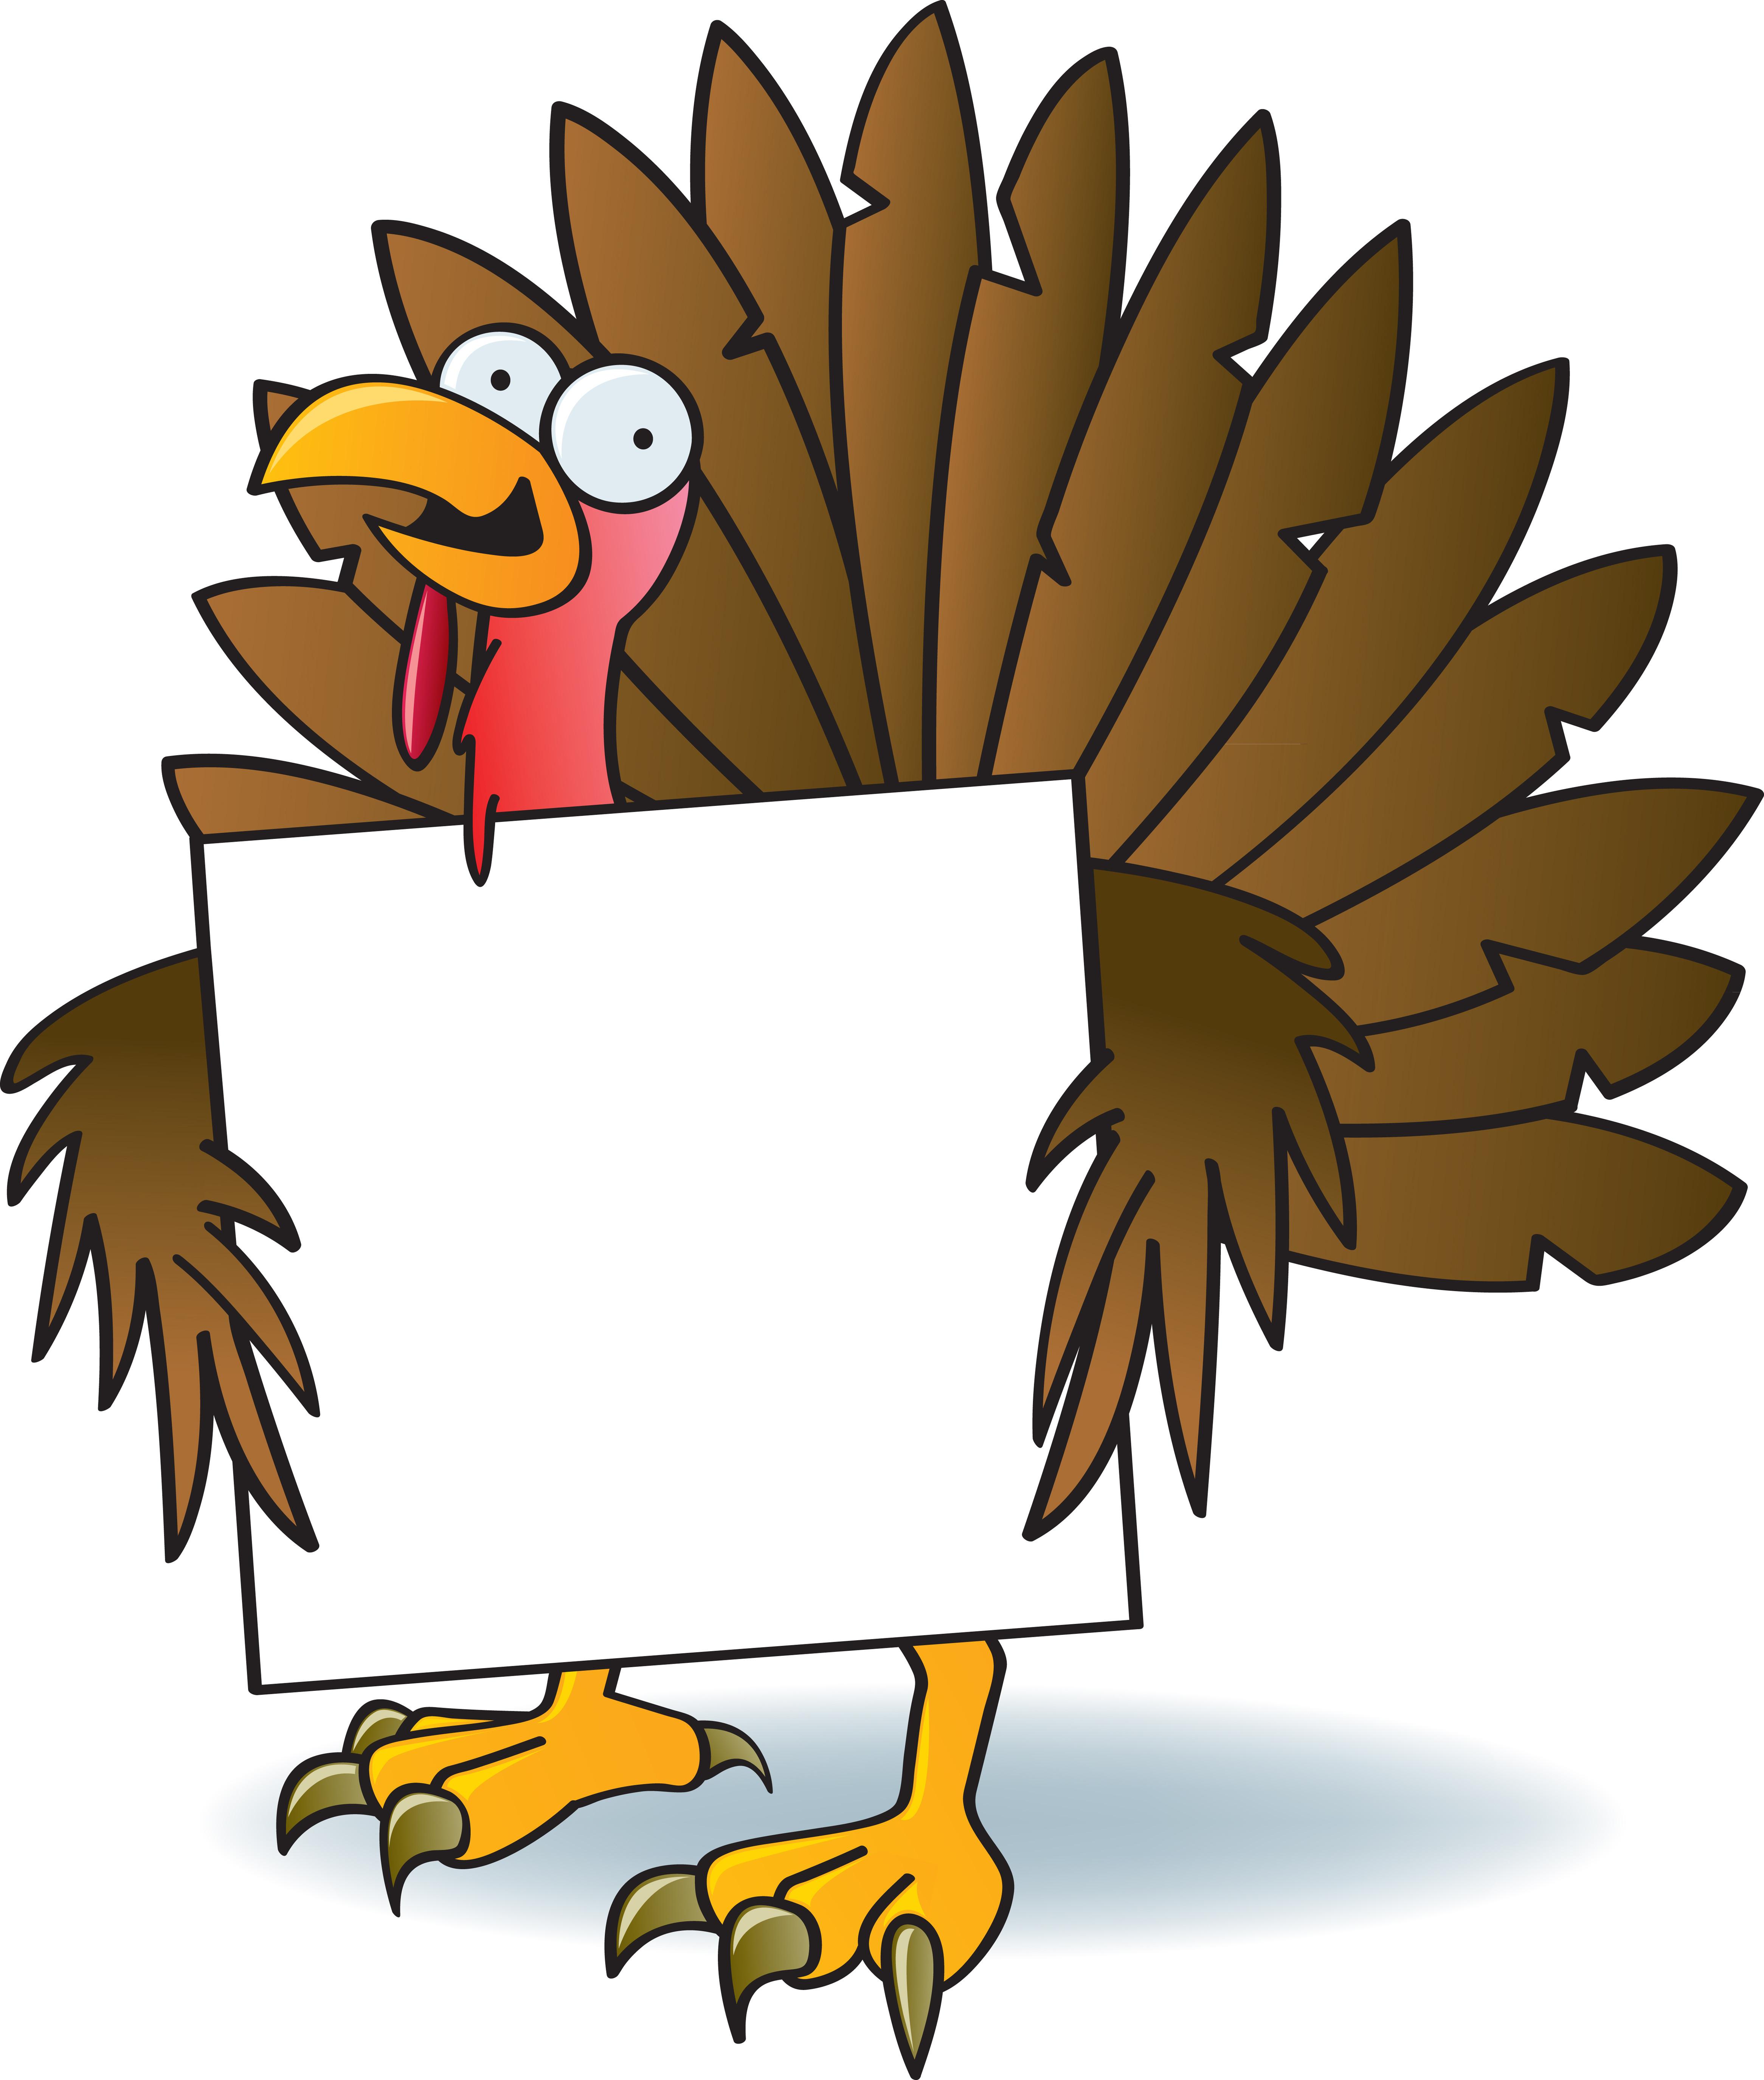 Thanksgiving Turkey Cartoon Images  Illustration Vector by Jamie Slavy at Coroflot